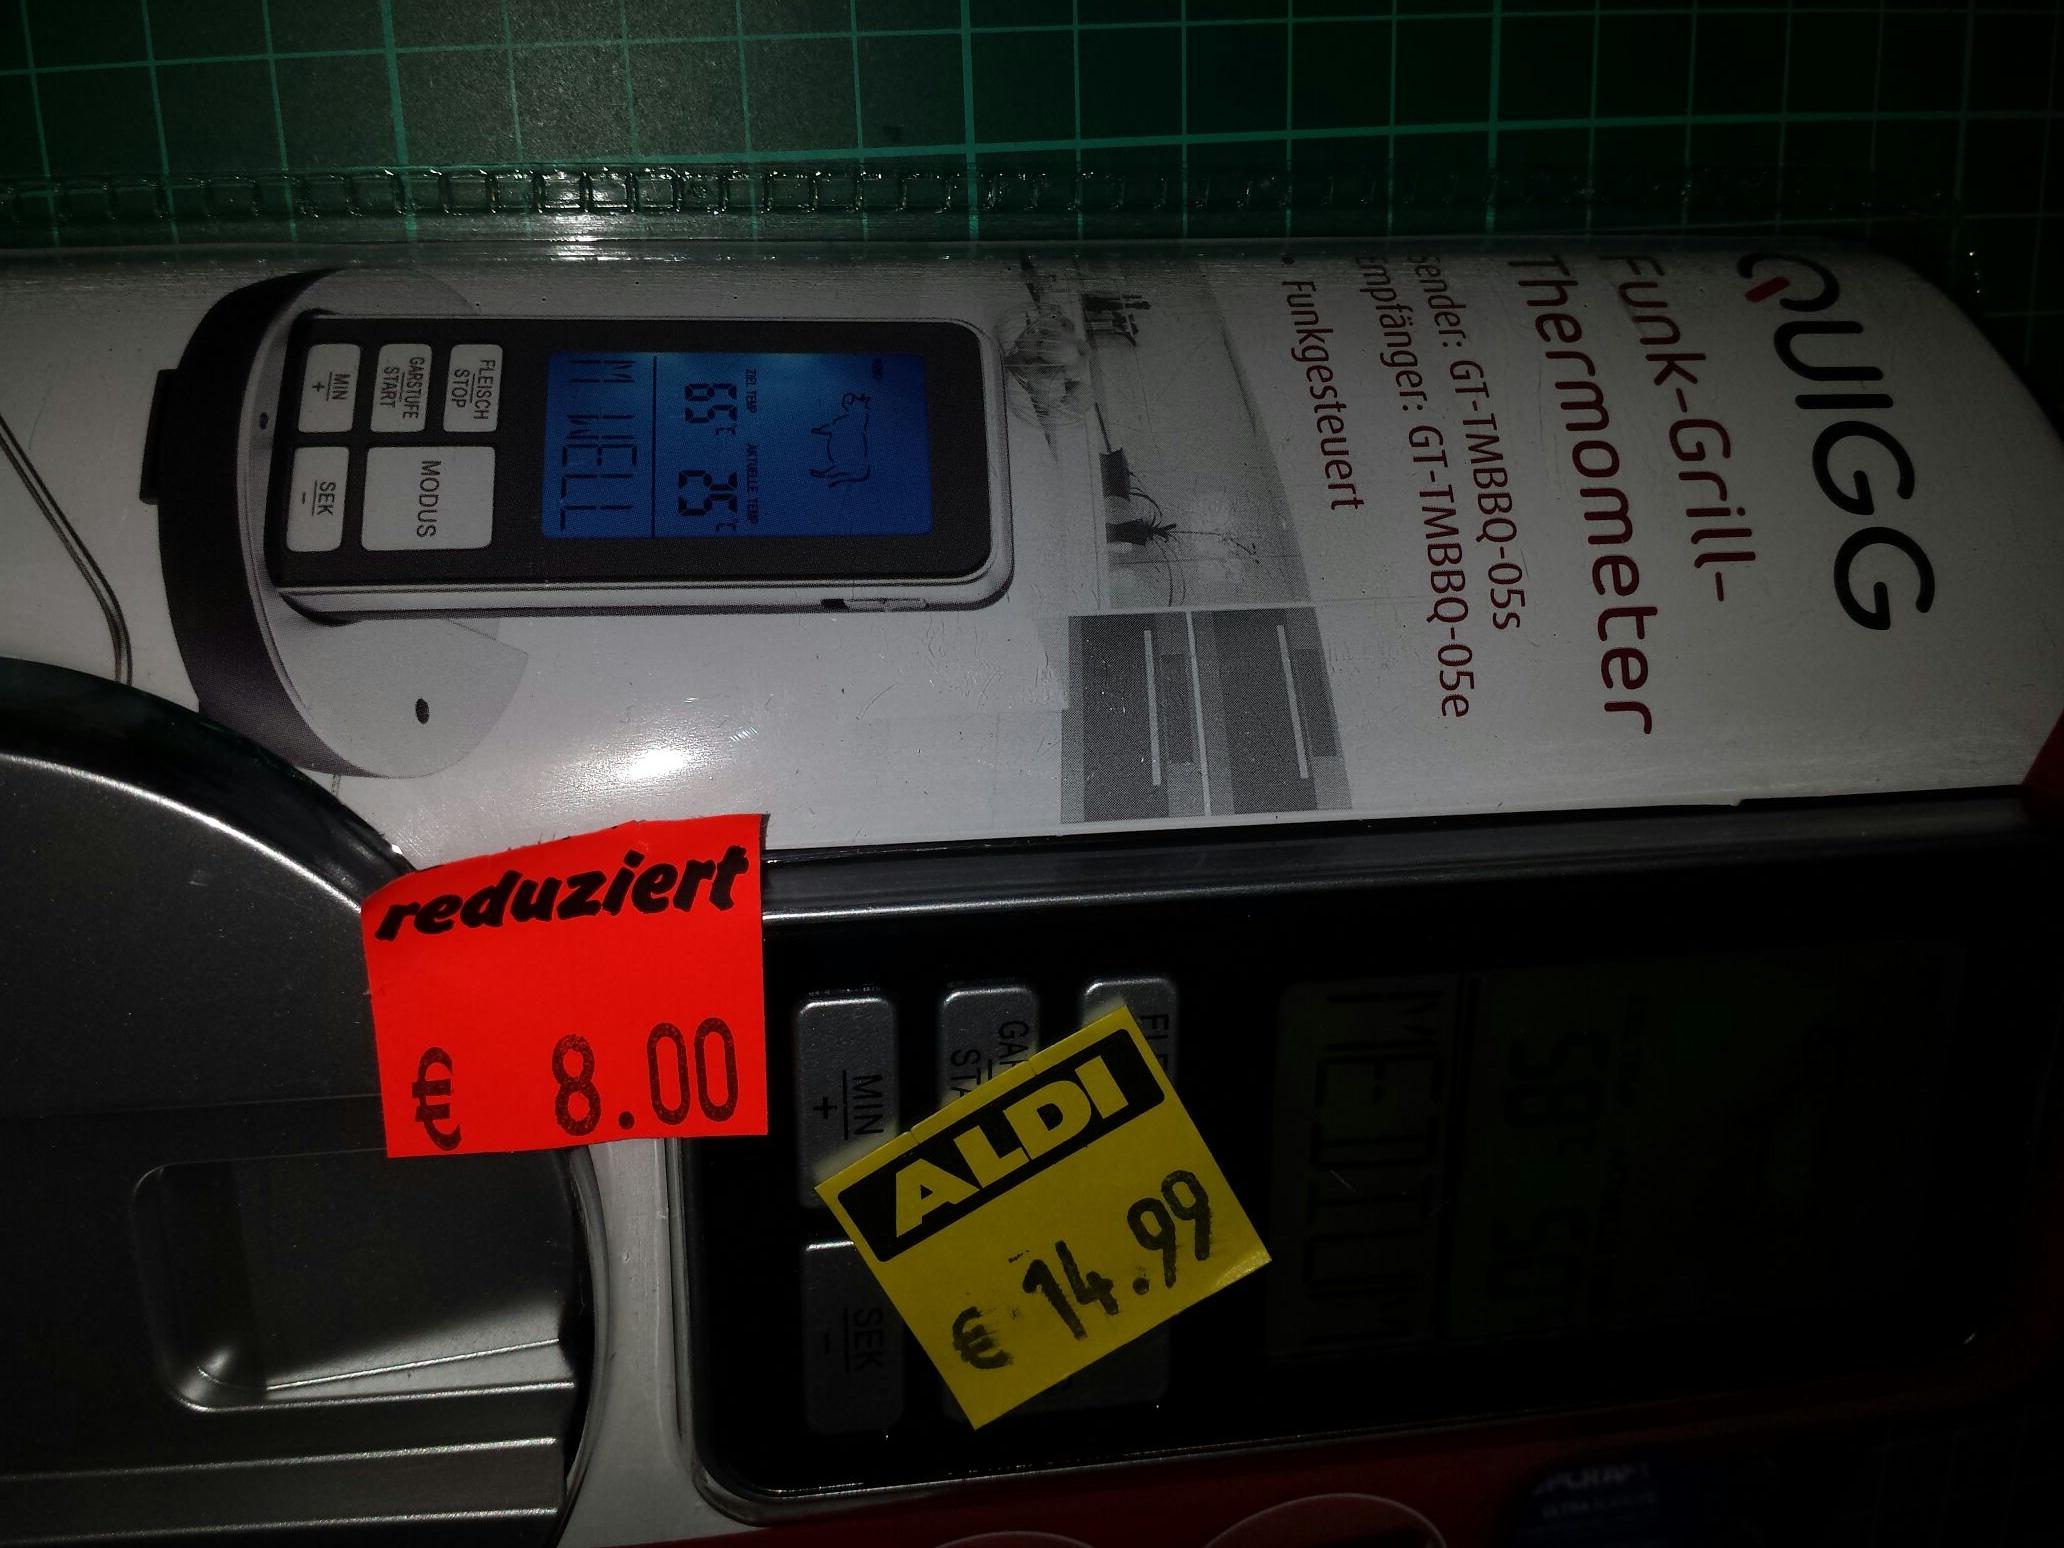 Lokal Aldi Tangermünde Funkgrillthermometer für 8€